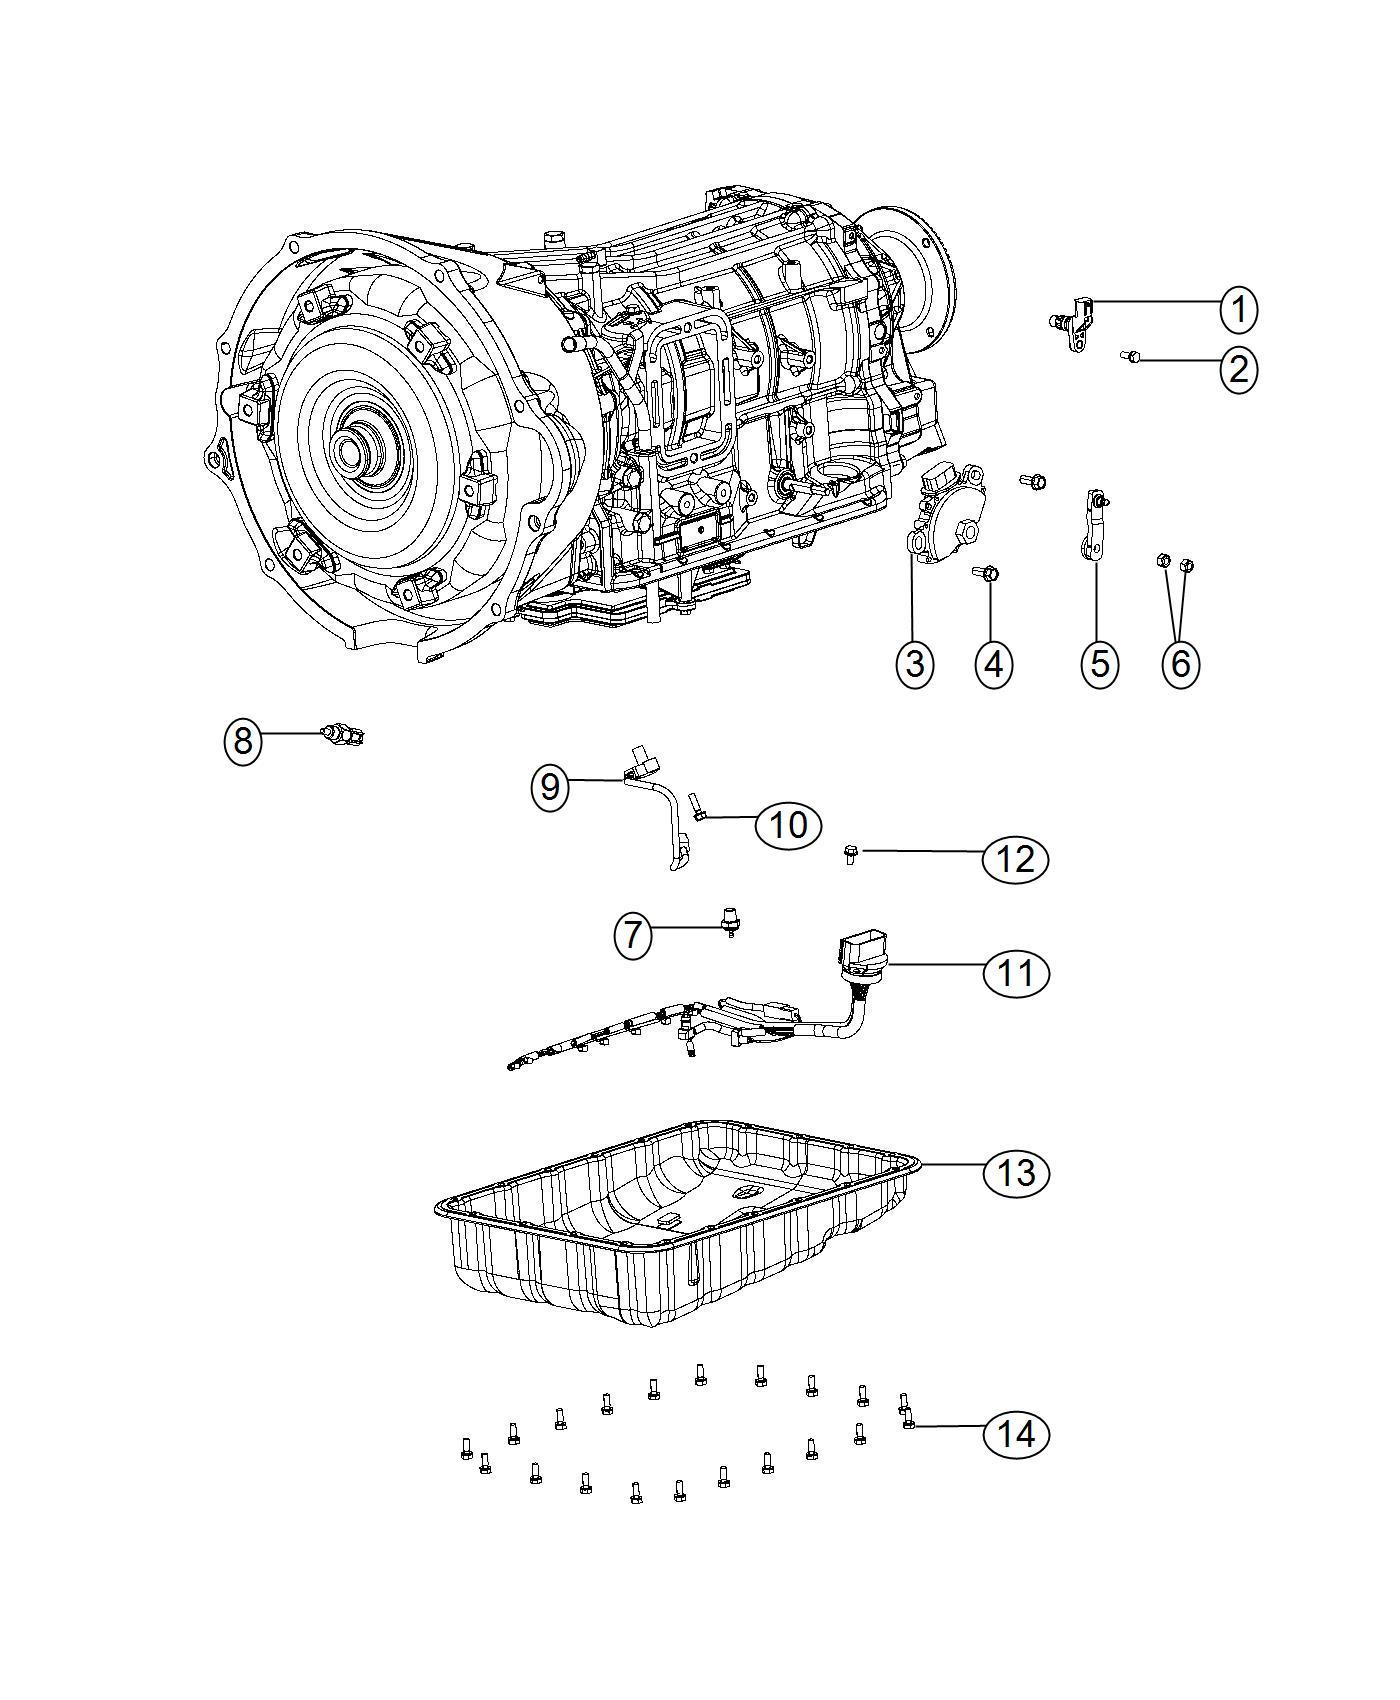 2017 ram 5500 wiring  transmission   lbv   internal wiring